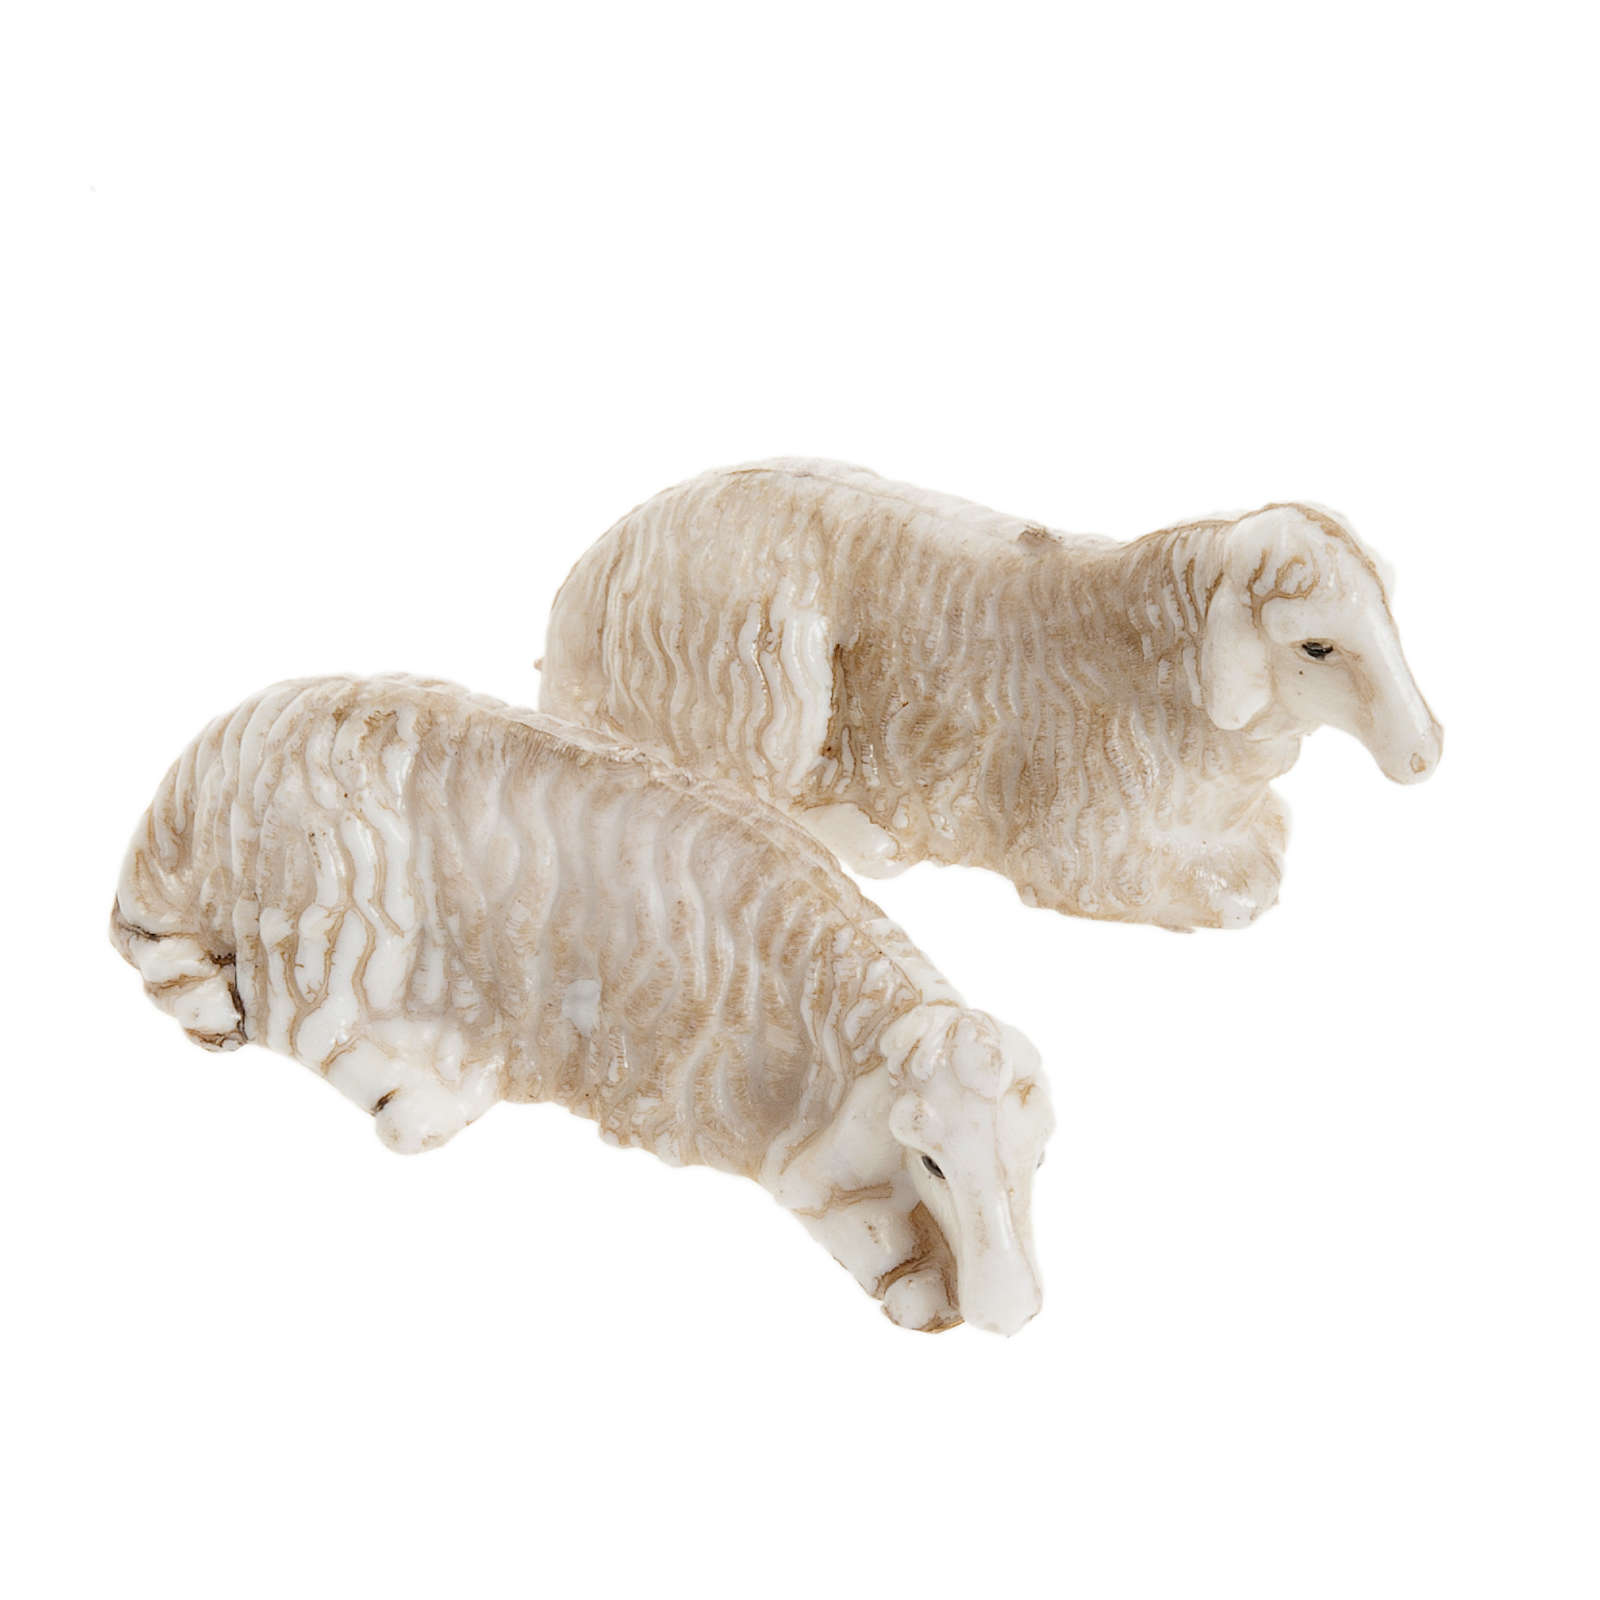 Pecore sdraiate presepe 8 cm set 2 pz. 3